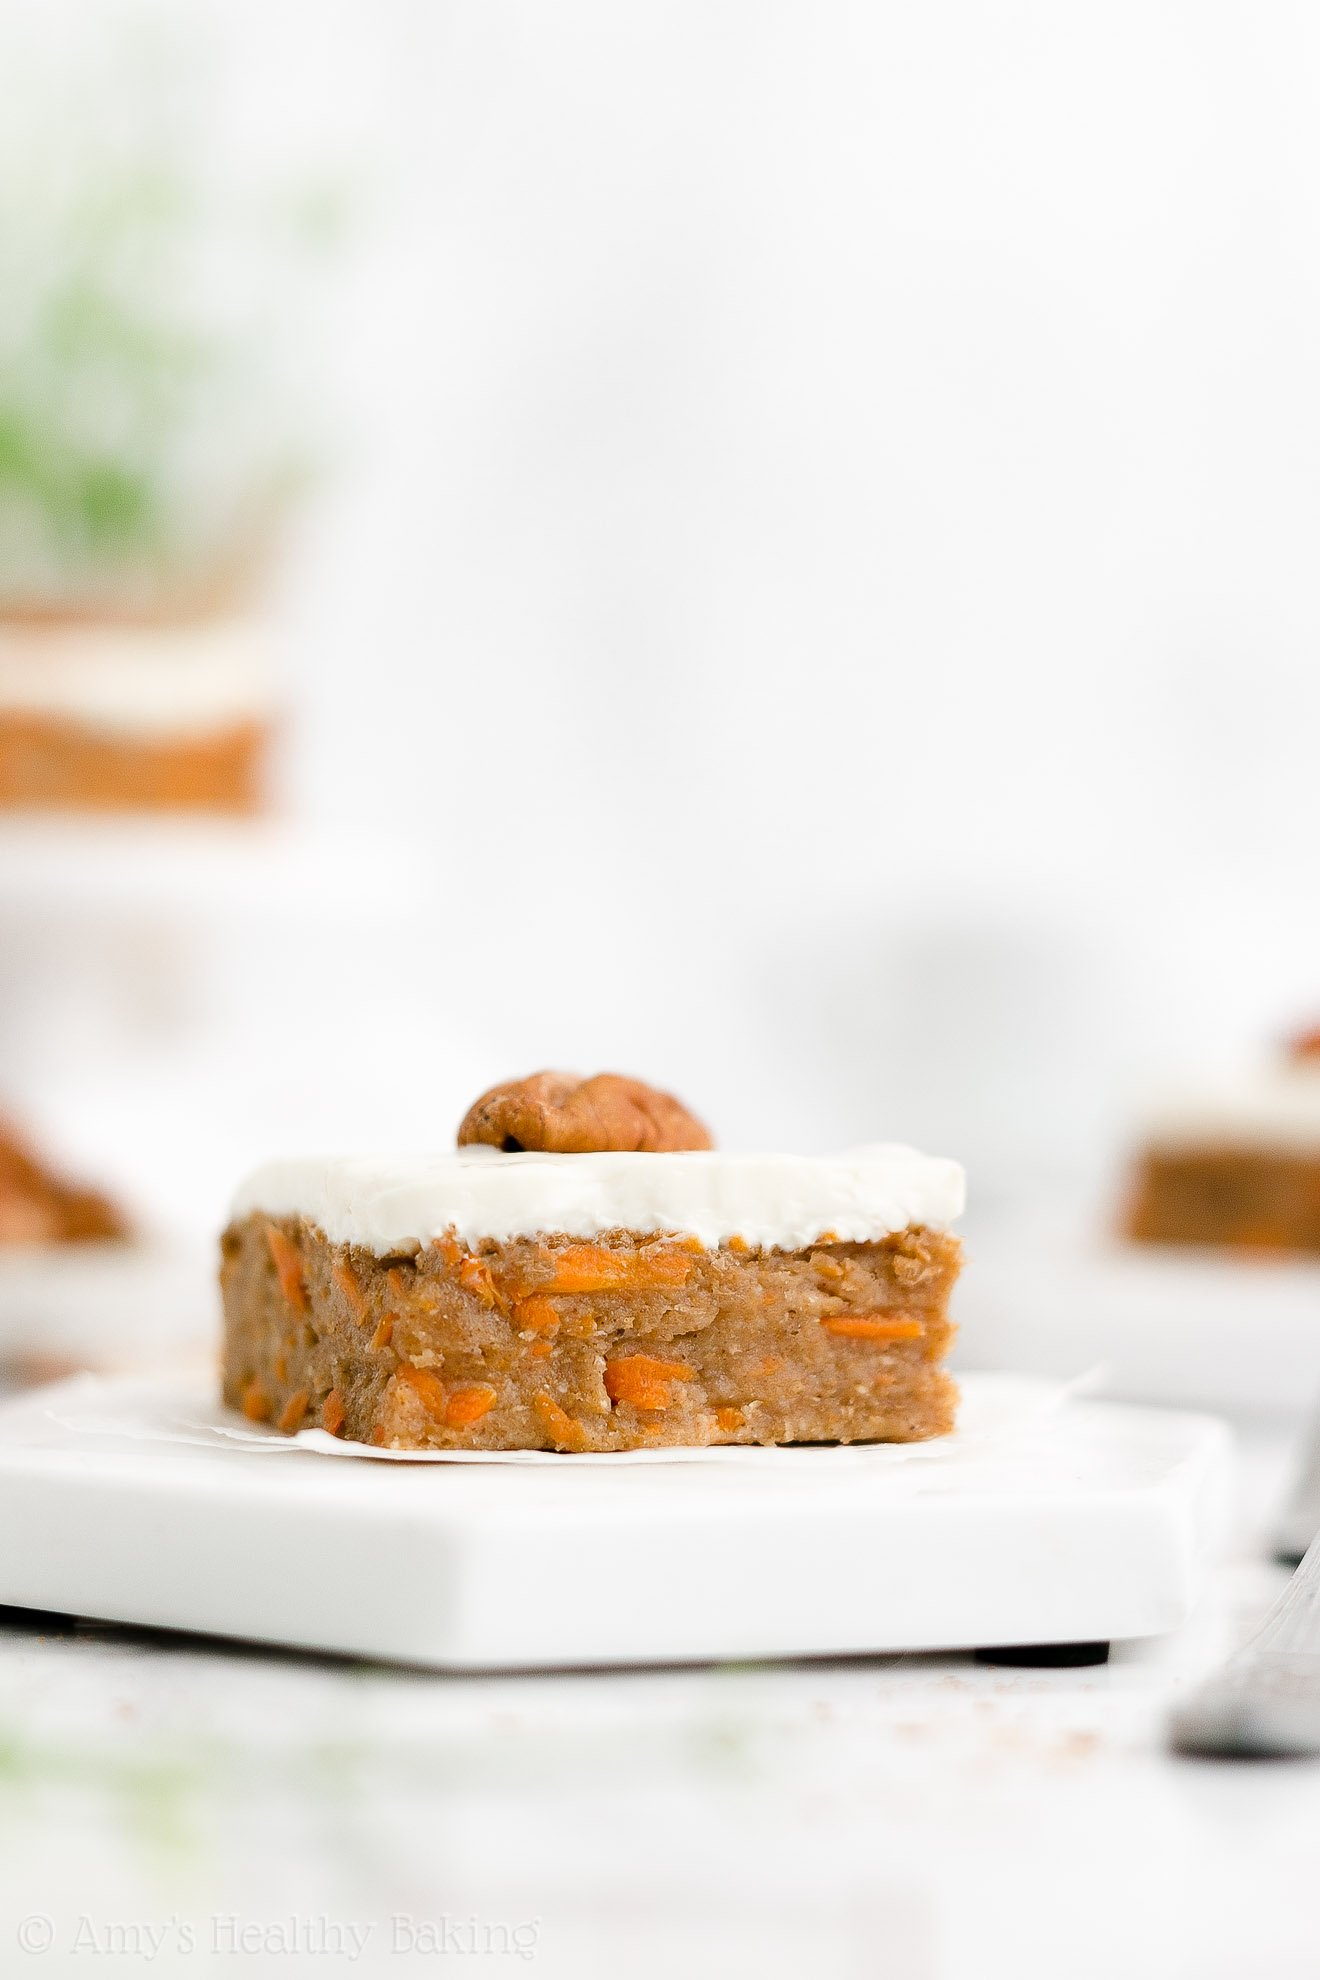 Healthy Clean Eating Greek Yogurt Carrot Cake Bars with Cream Cheese Frosting